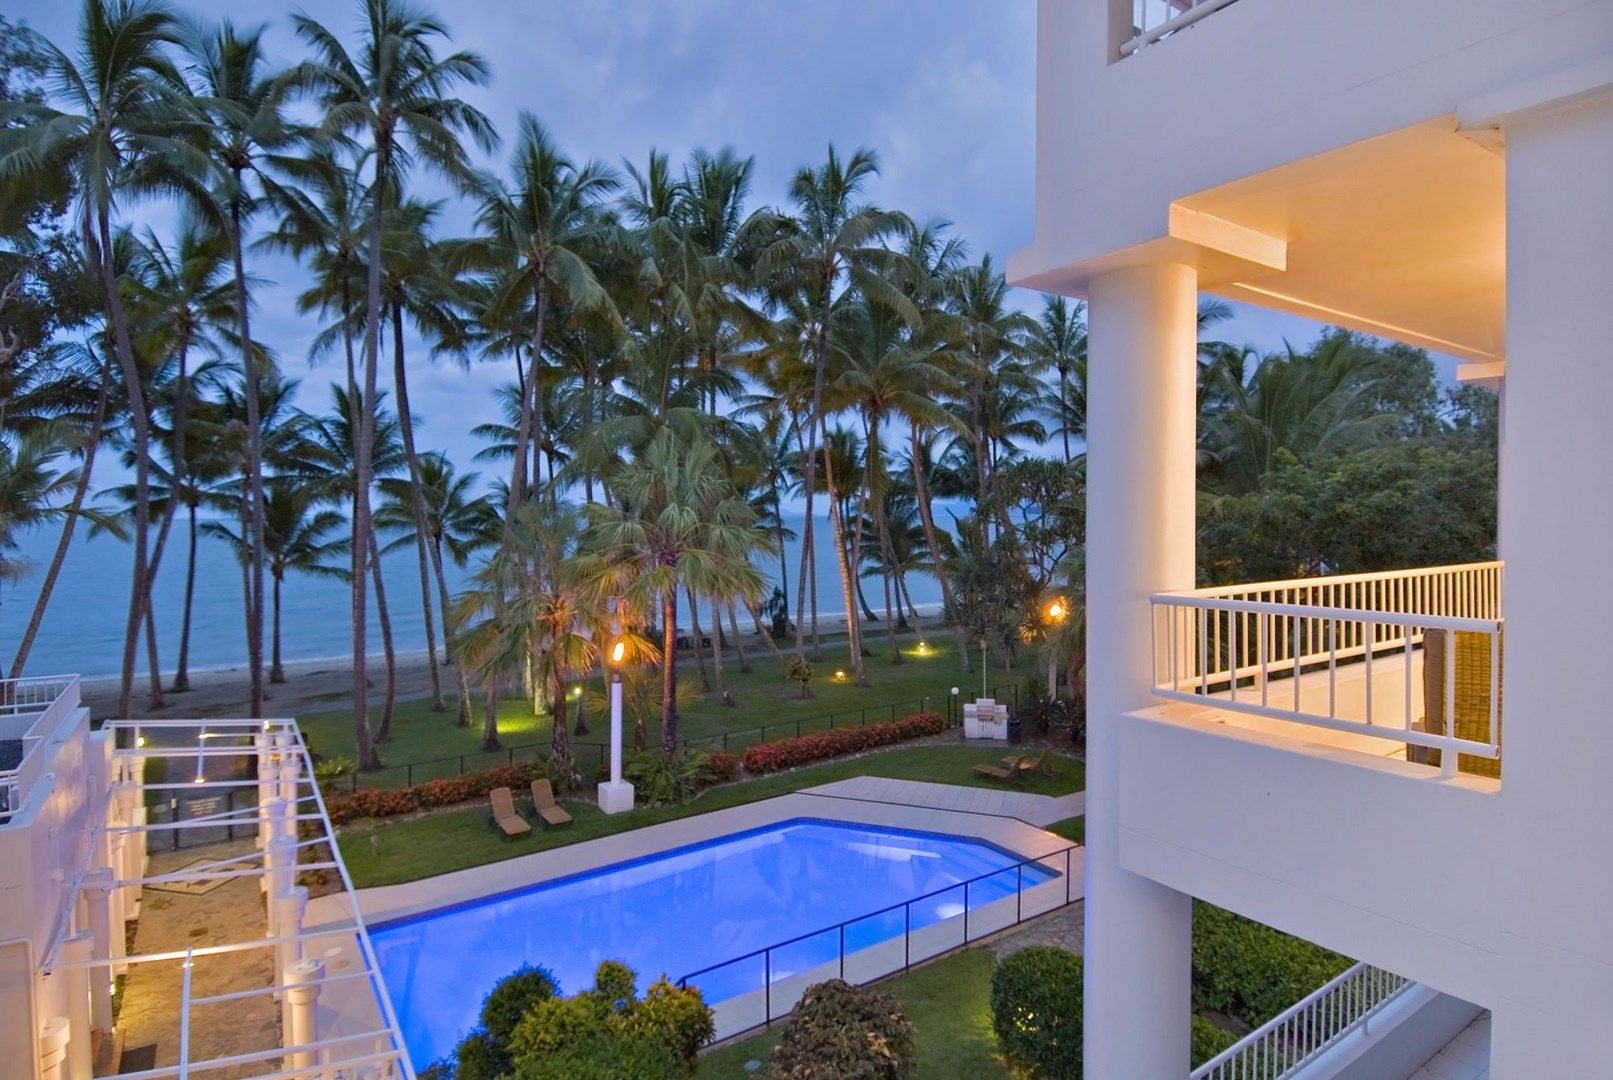 16 alamanda beachfront st palm cove qld 4879 apartment. Black Bedroom Furniture Sets. Home Design Ideas